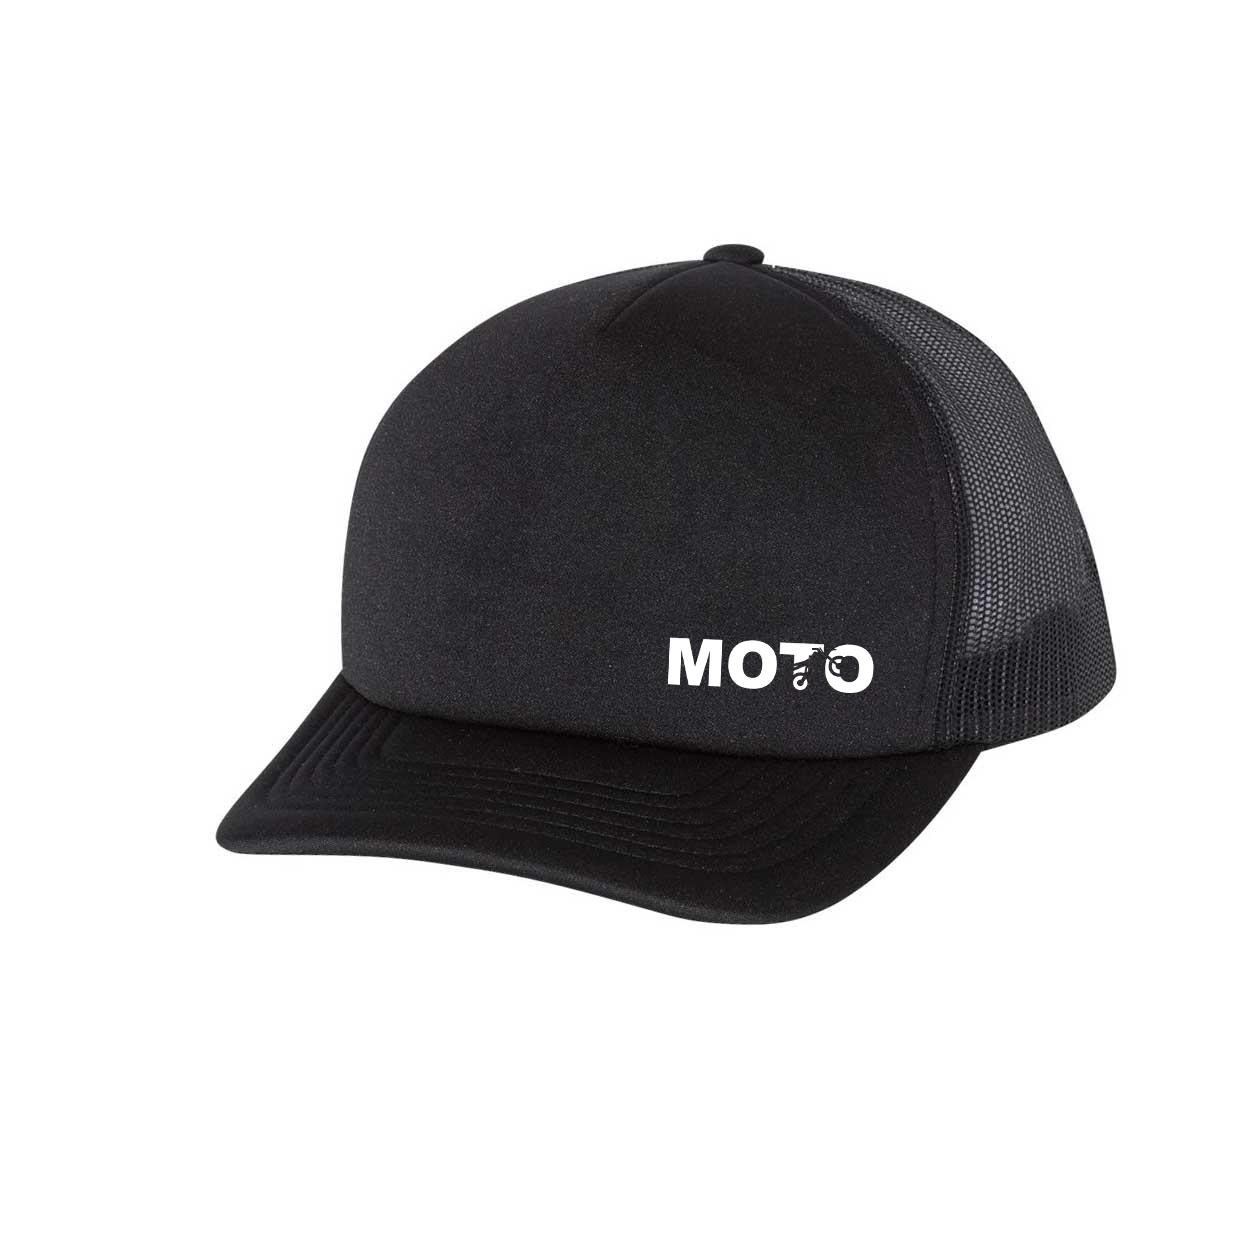 Moto Wheelie Logo Night Out Premium Foam Trucker Snapback Hat Black (White Logo)